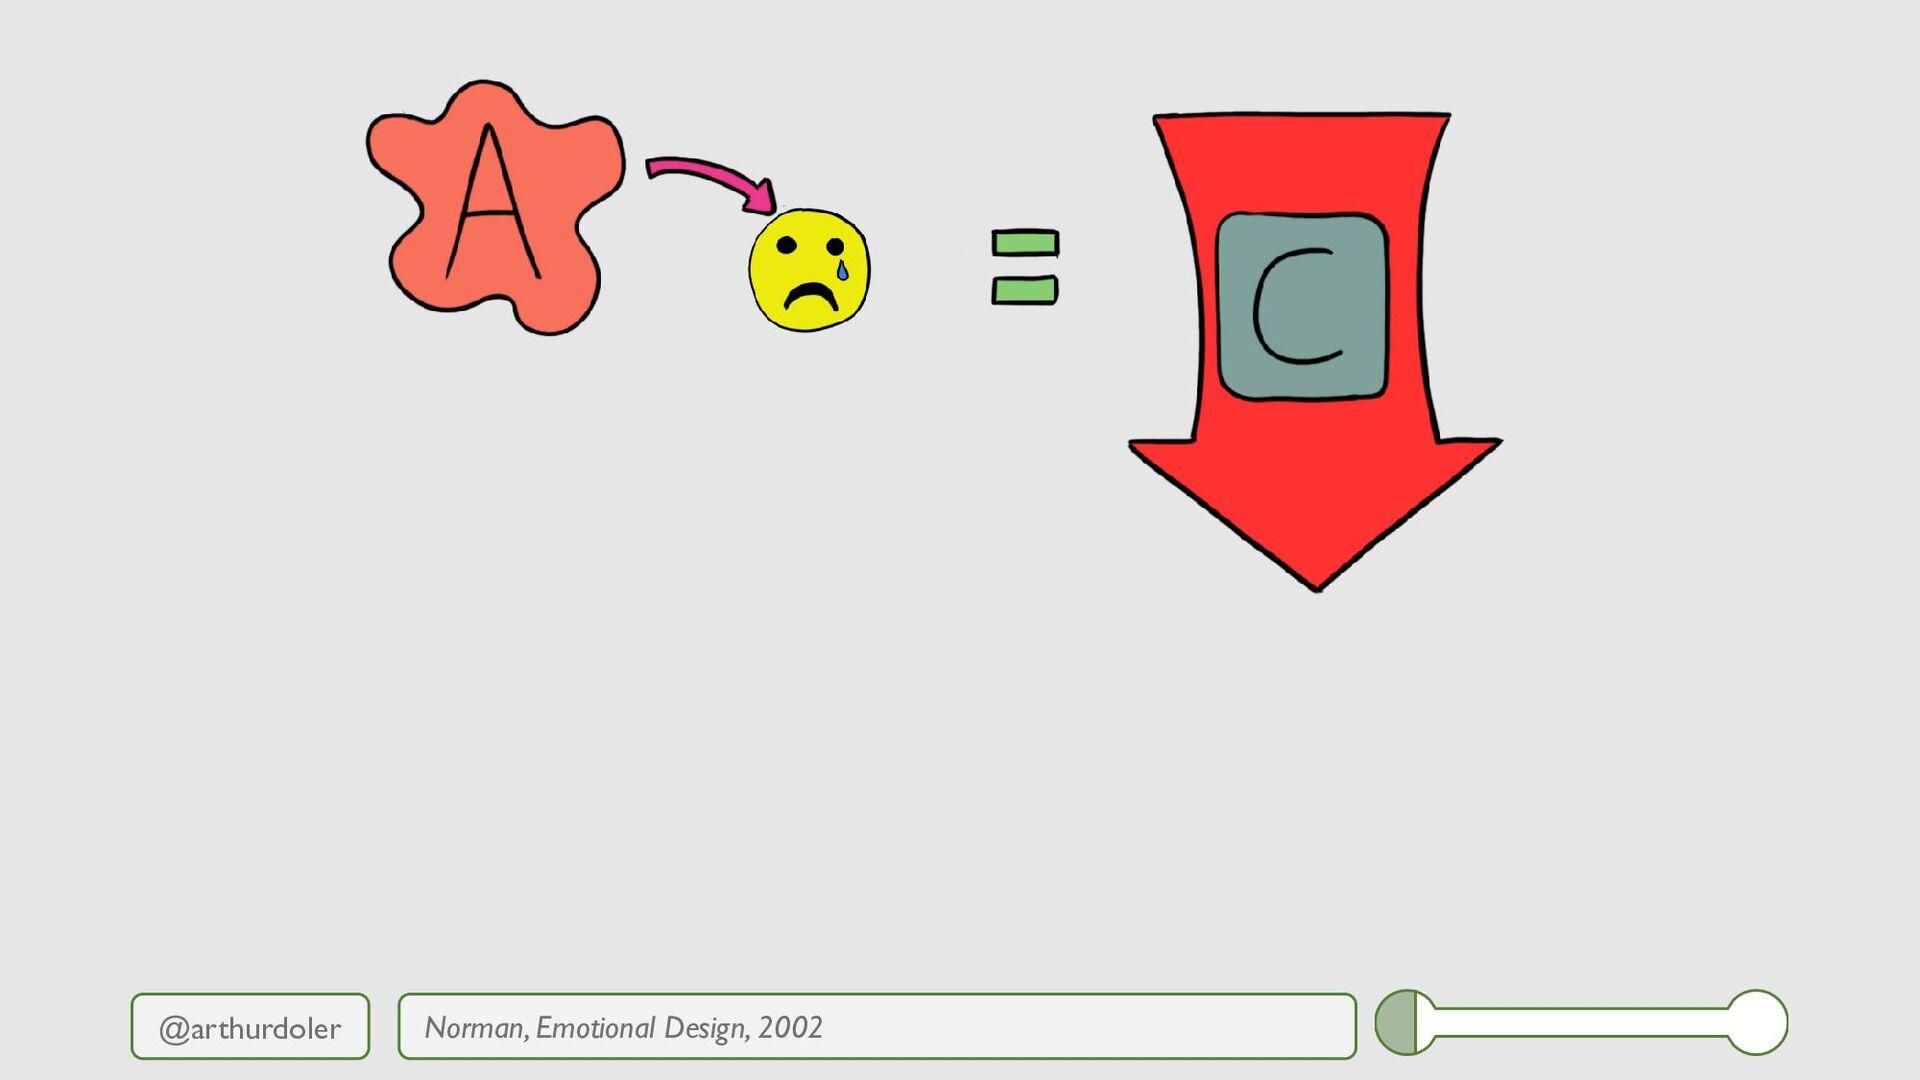 @arthurdoler Norman, Emotional Design, 2002